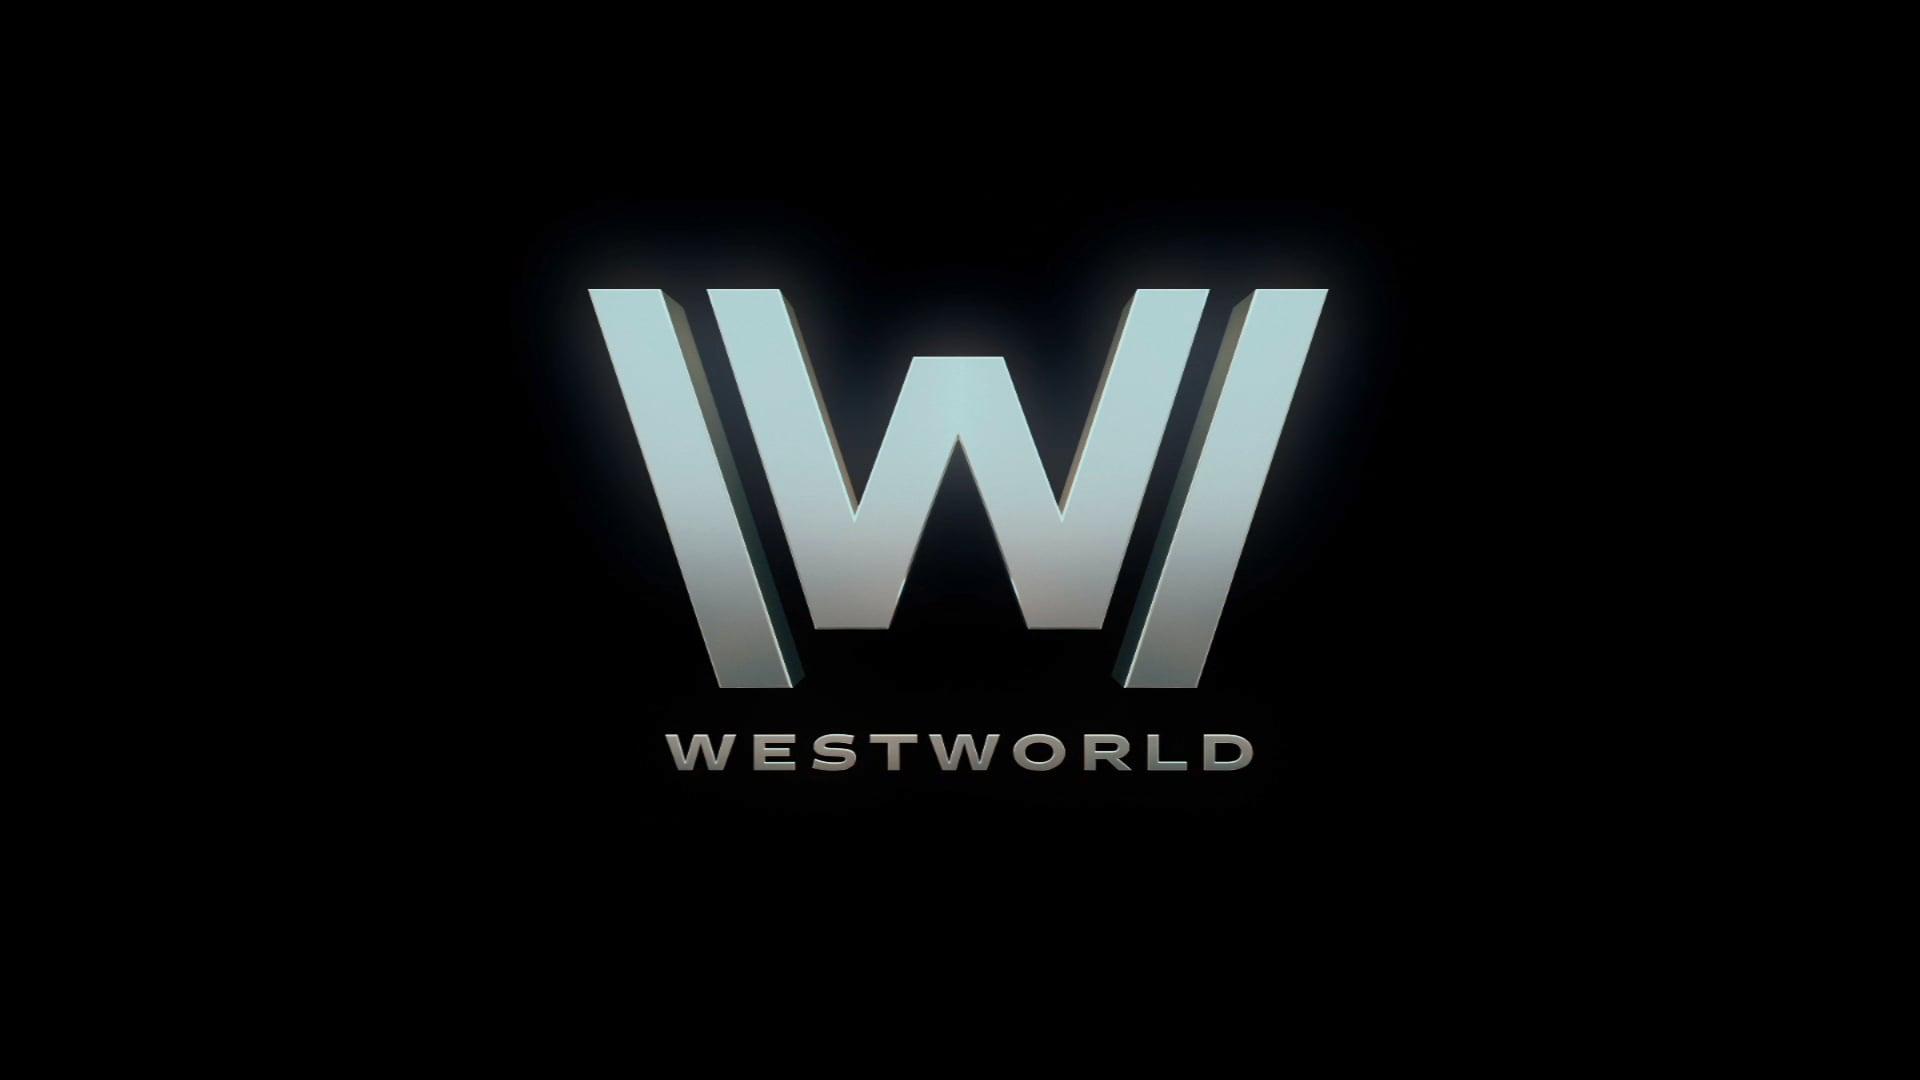 WESTWORLD - HBO jingle - Mathieu Lebot